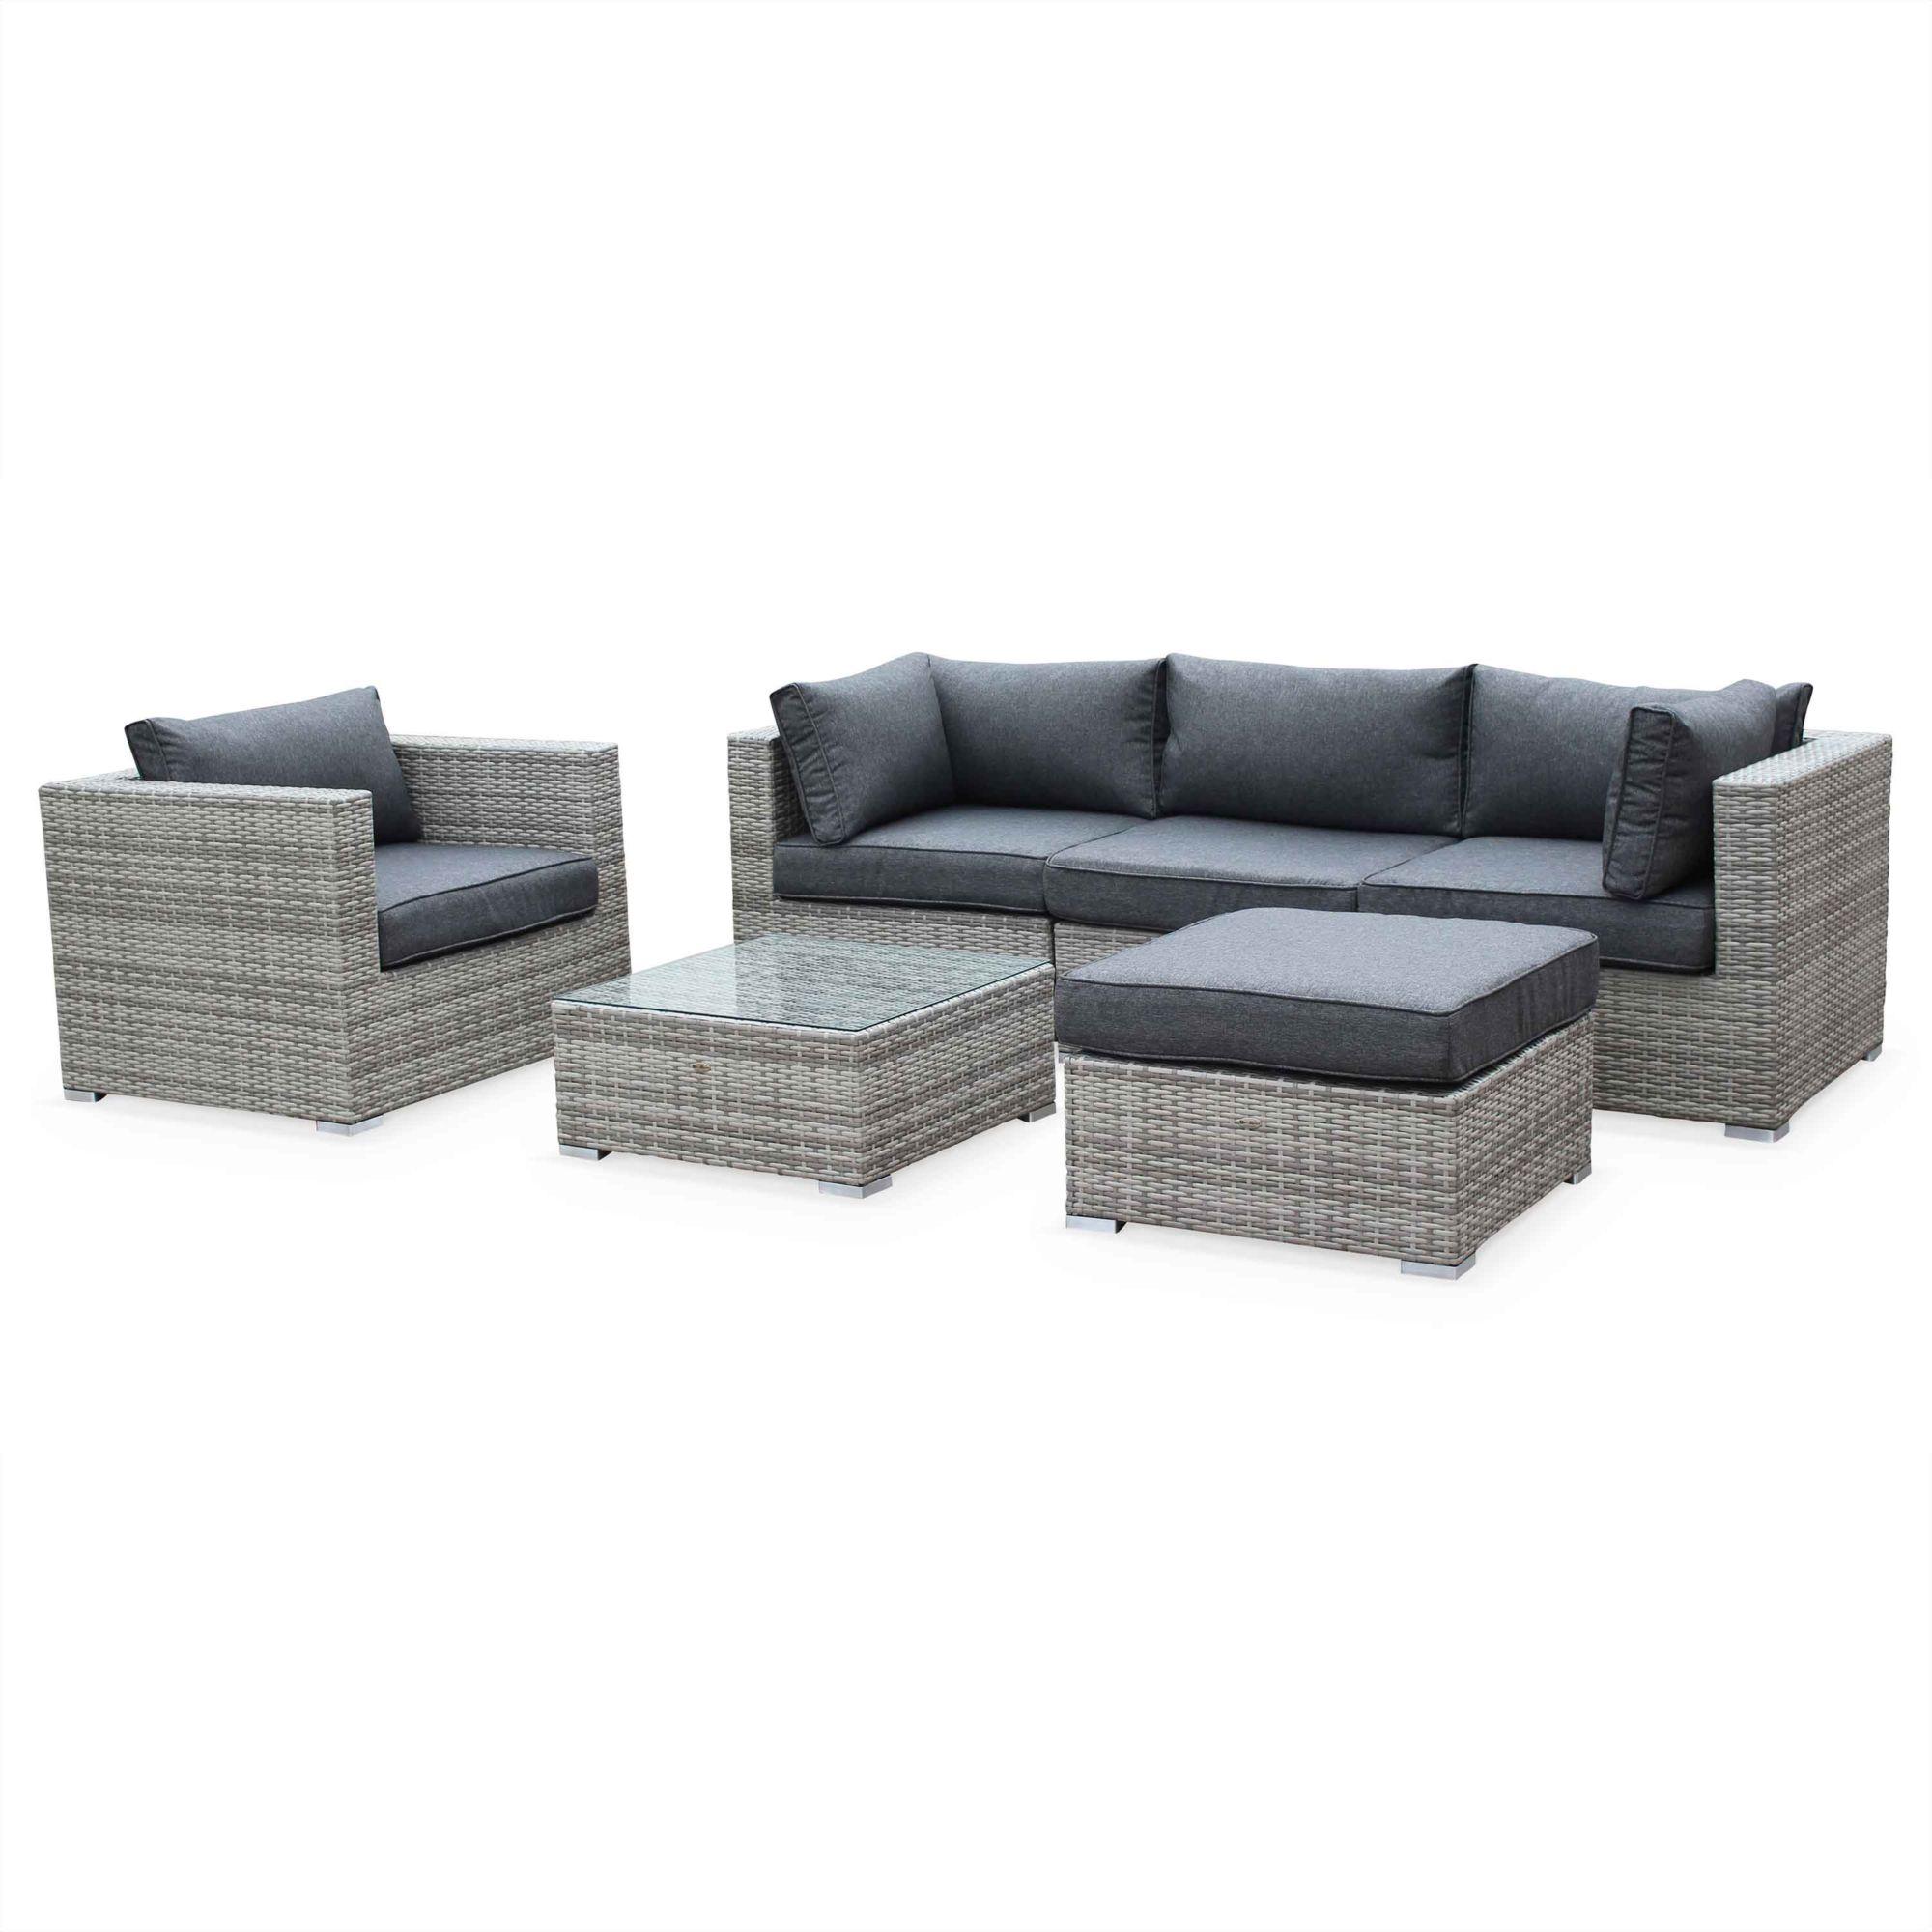 Caligari 5 Seater Outdoor Lounge Set Brown Wicker Brown Cushions Aluminium Frame Outdoor Lounge Set Garden Sofa Set Outdoor Lounge